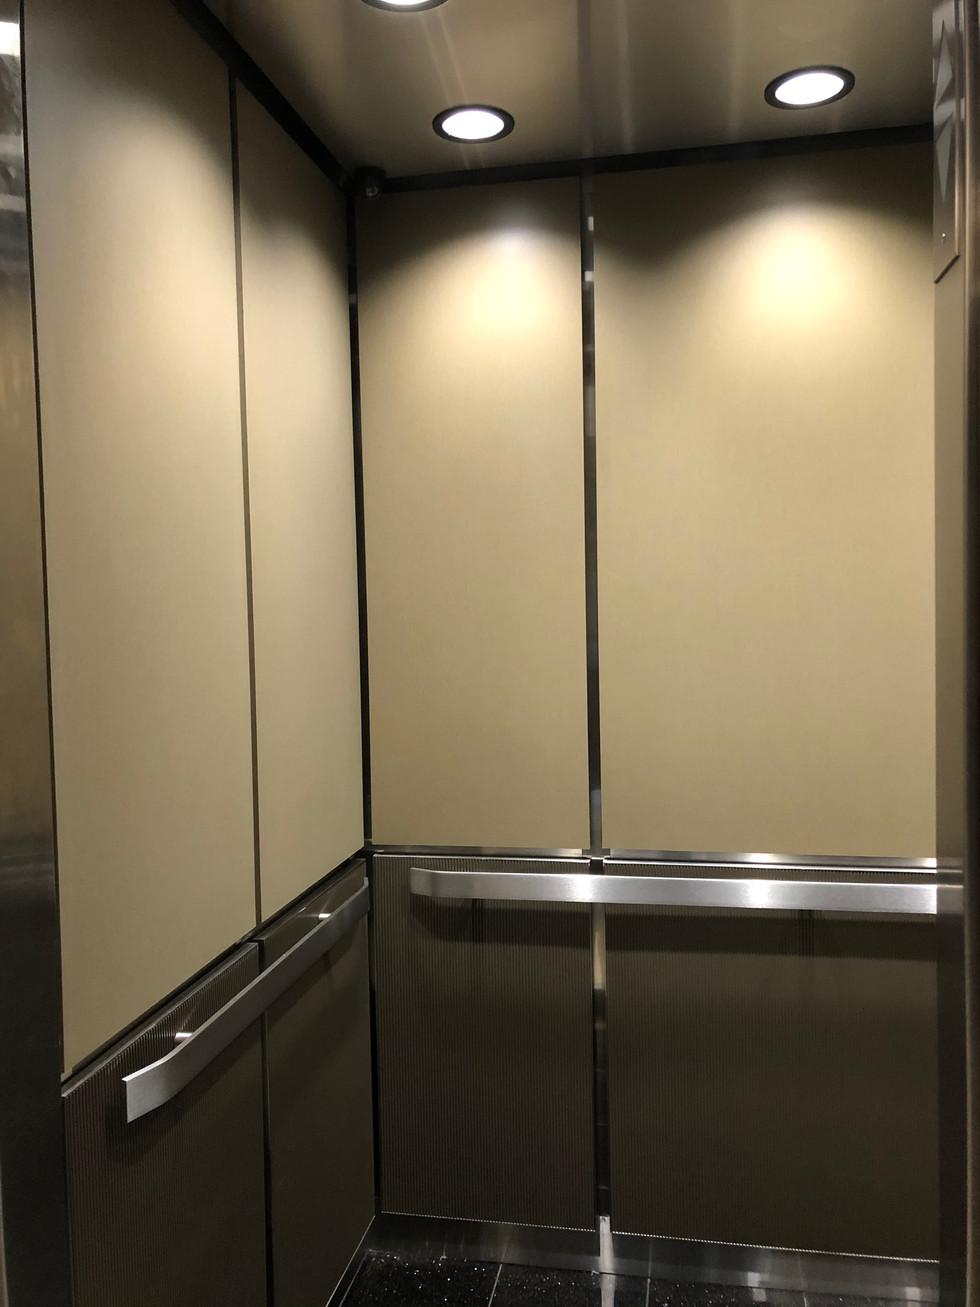 3410 Lakeshore Dr - (Car 2) Elevator Panels